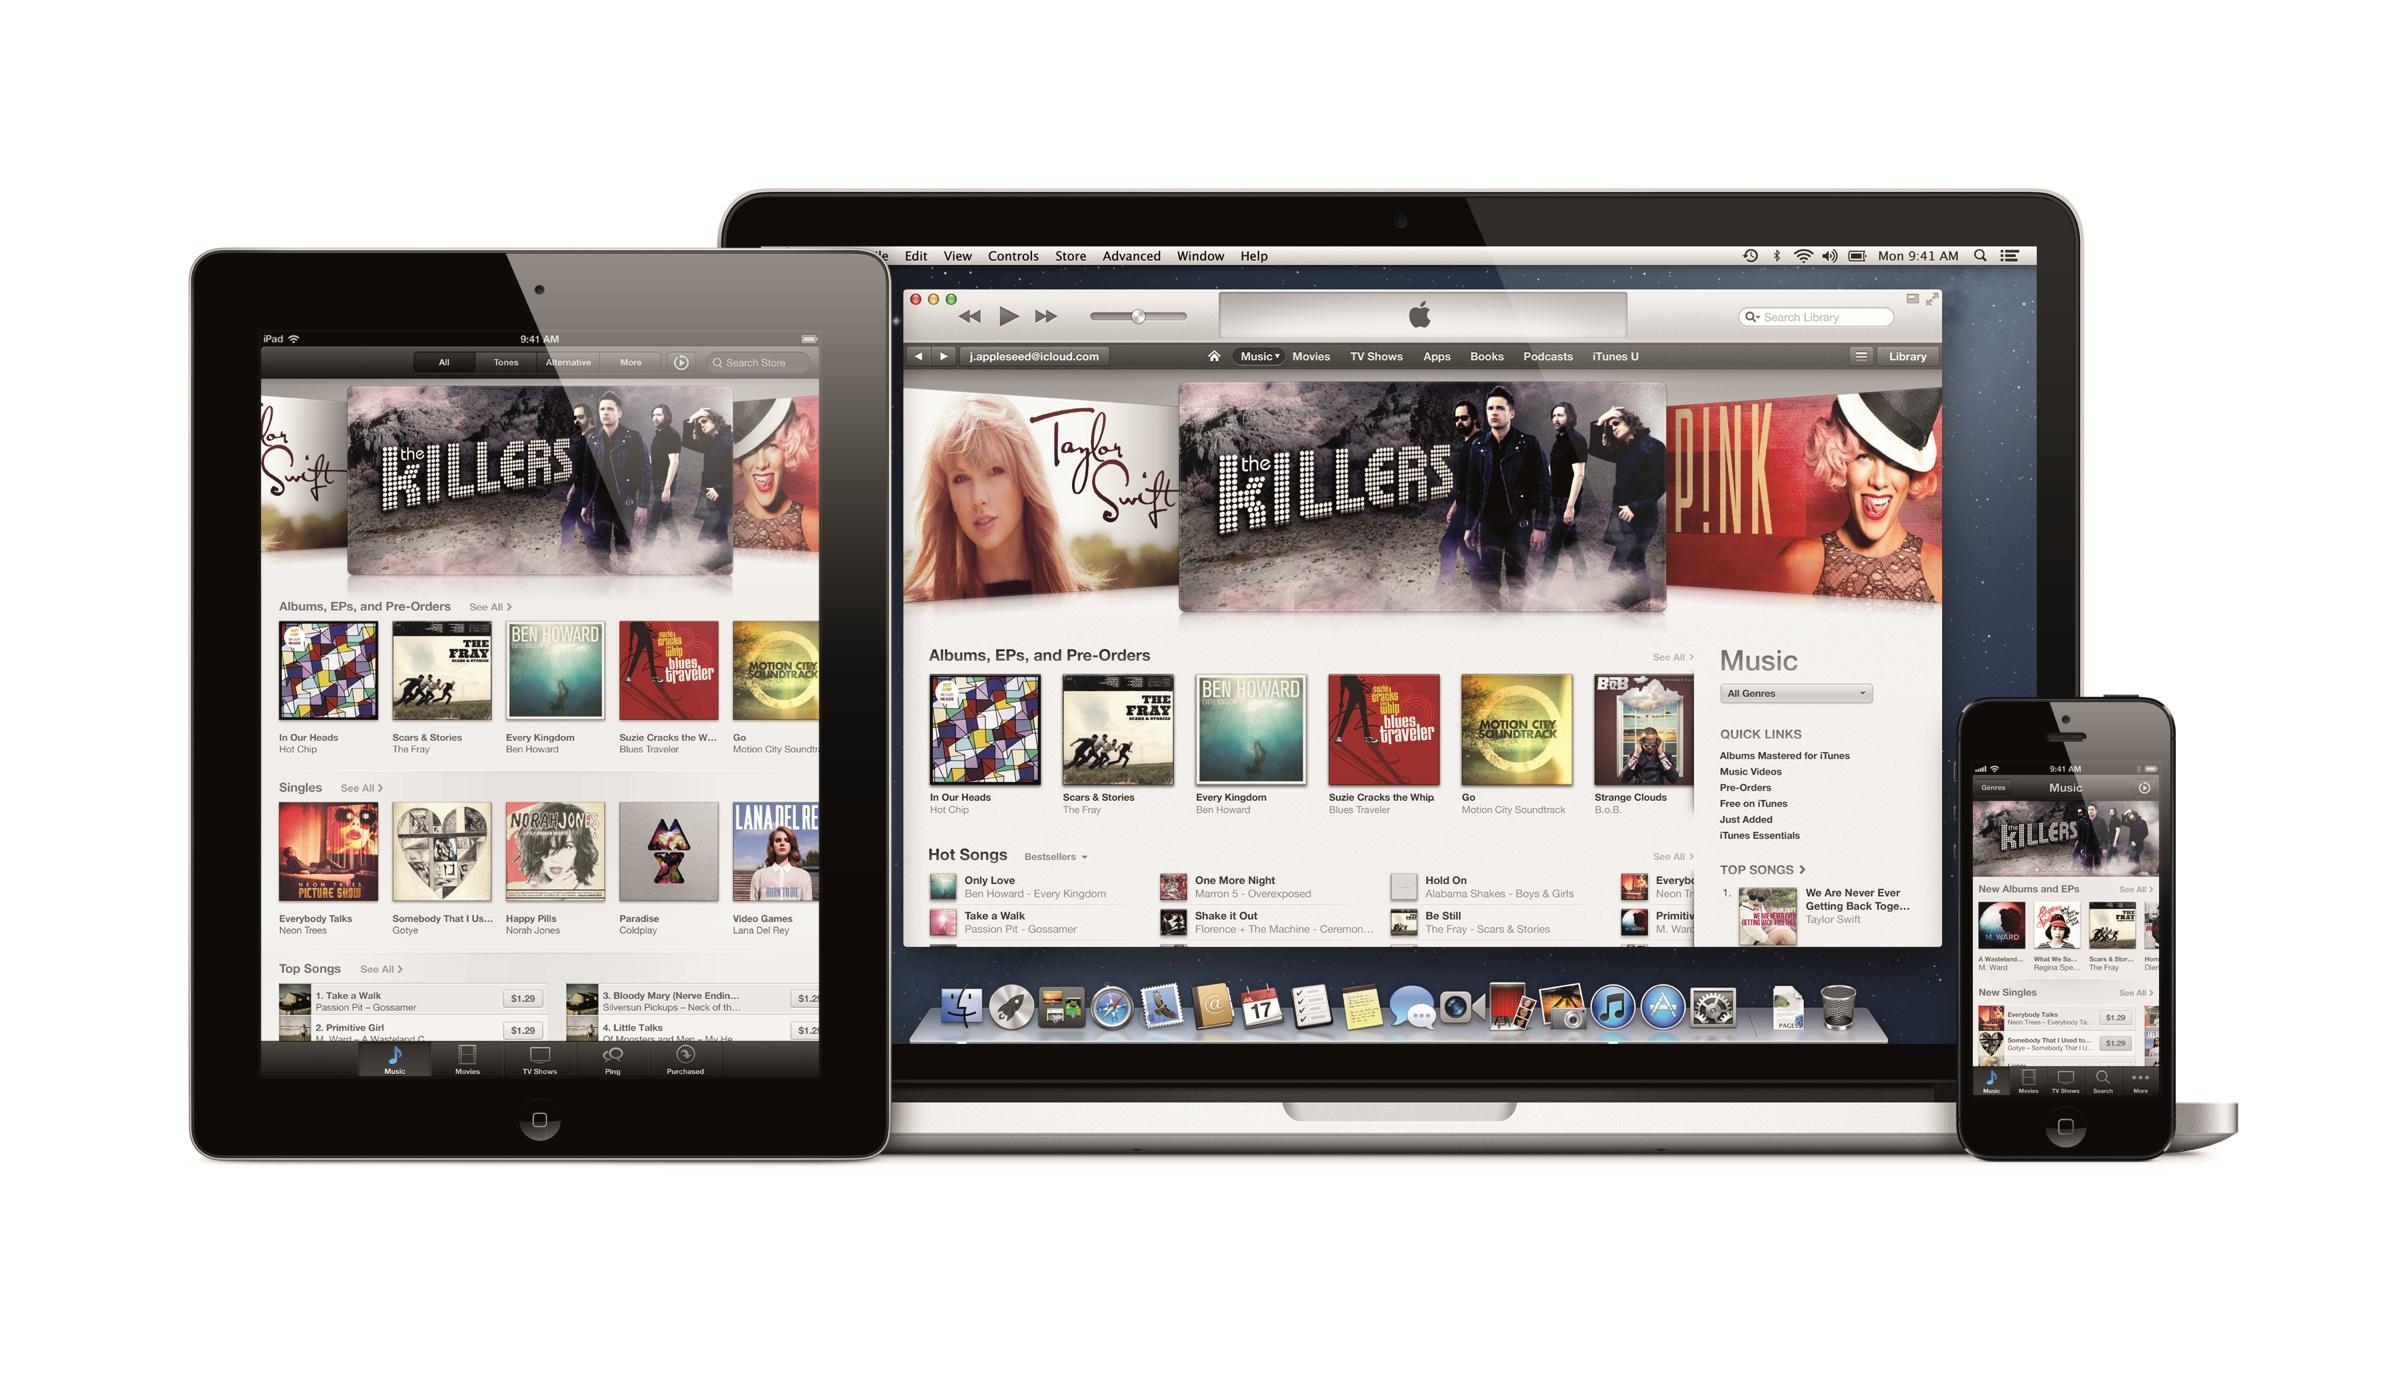 iTunes 11 Review: Sleek look defines latest update